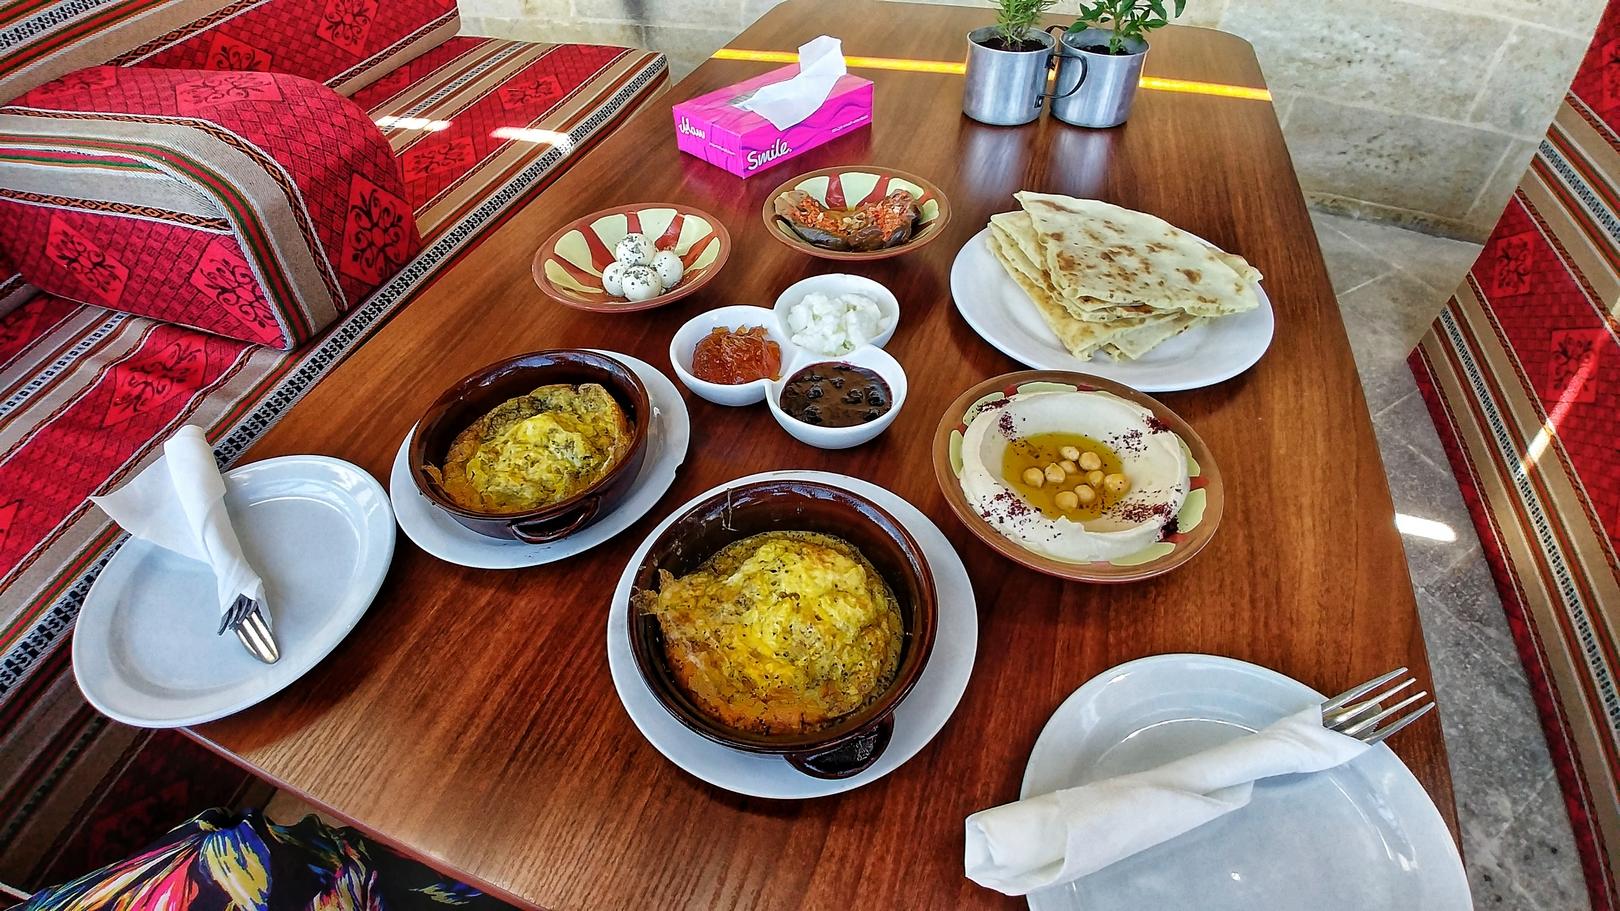 Jordanie - Petit déjeuner roboratif à Salt